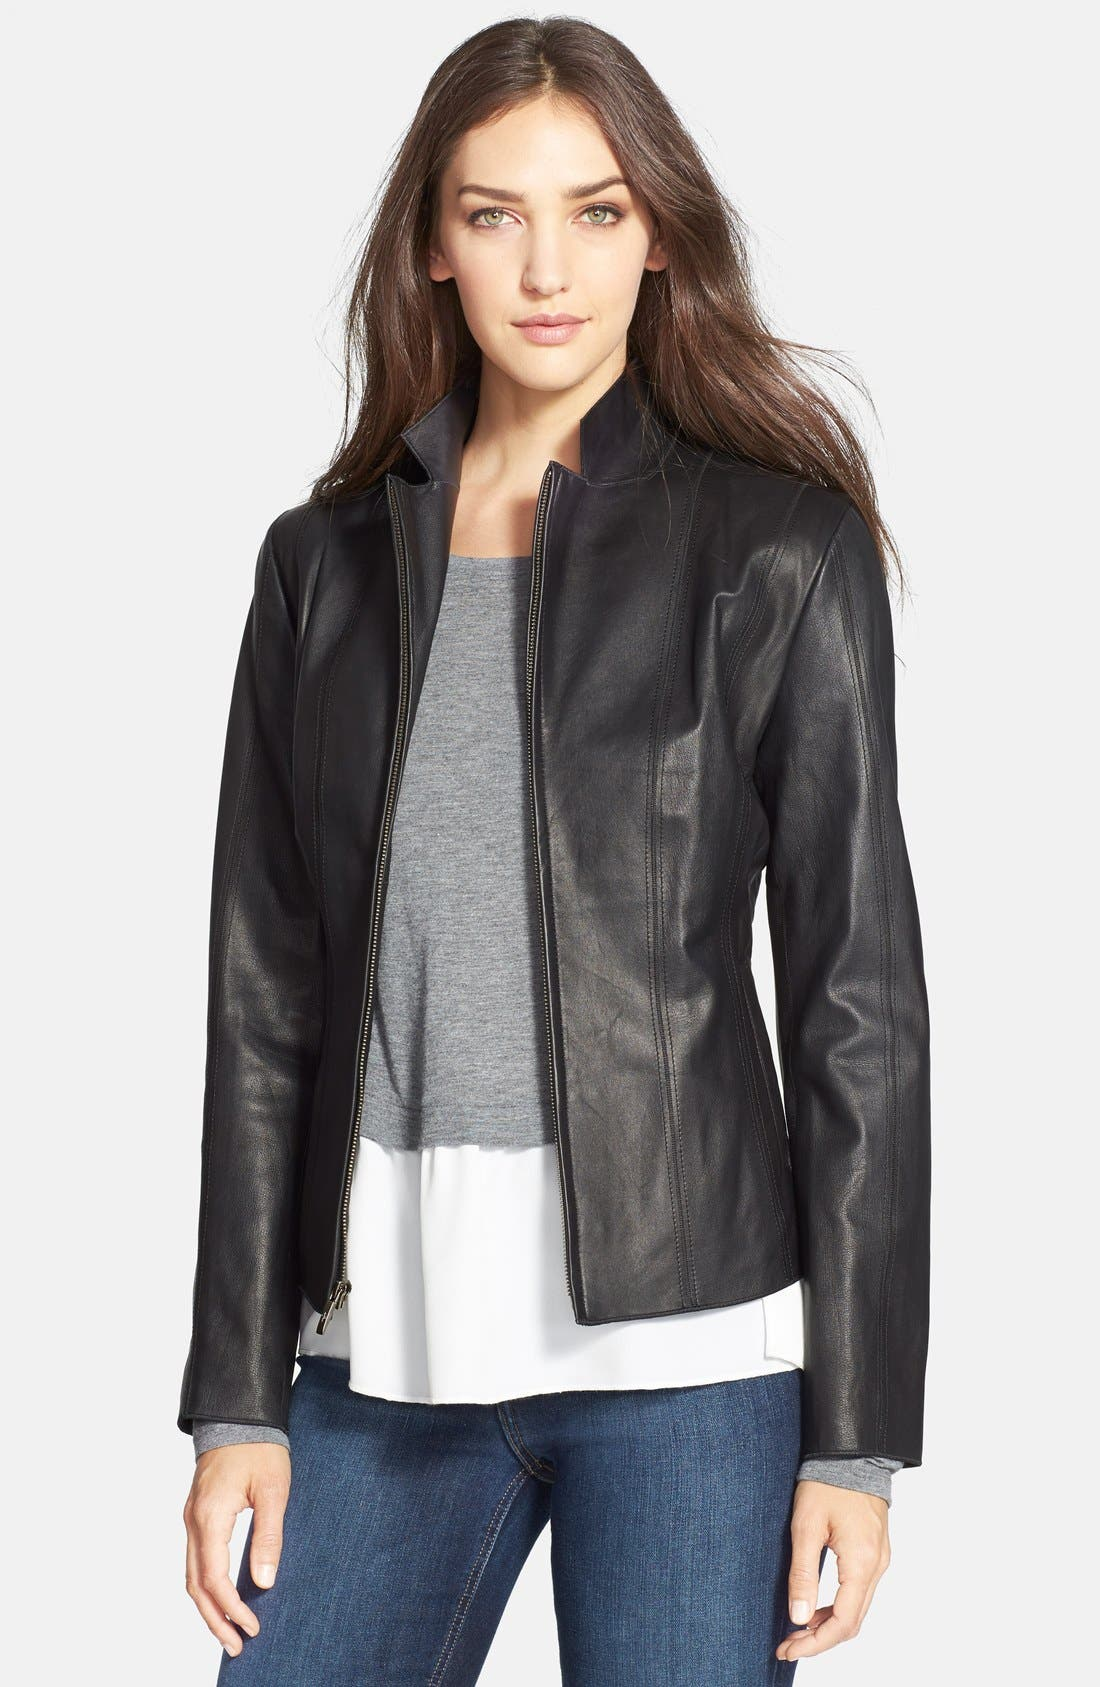 Alternate Image 1 Selected - Cole Haan Notch Collar Lambskin Leather Jacket (Regular & Petite)